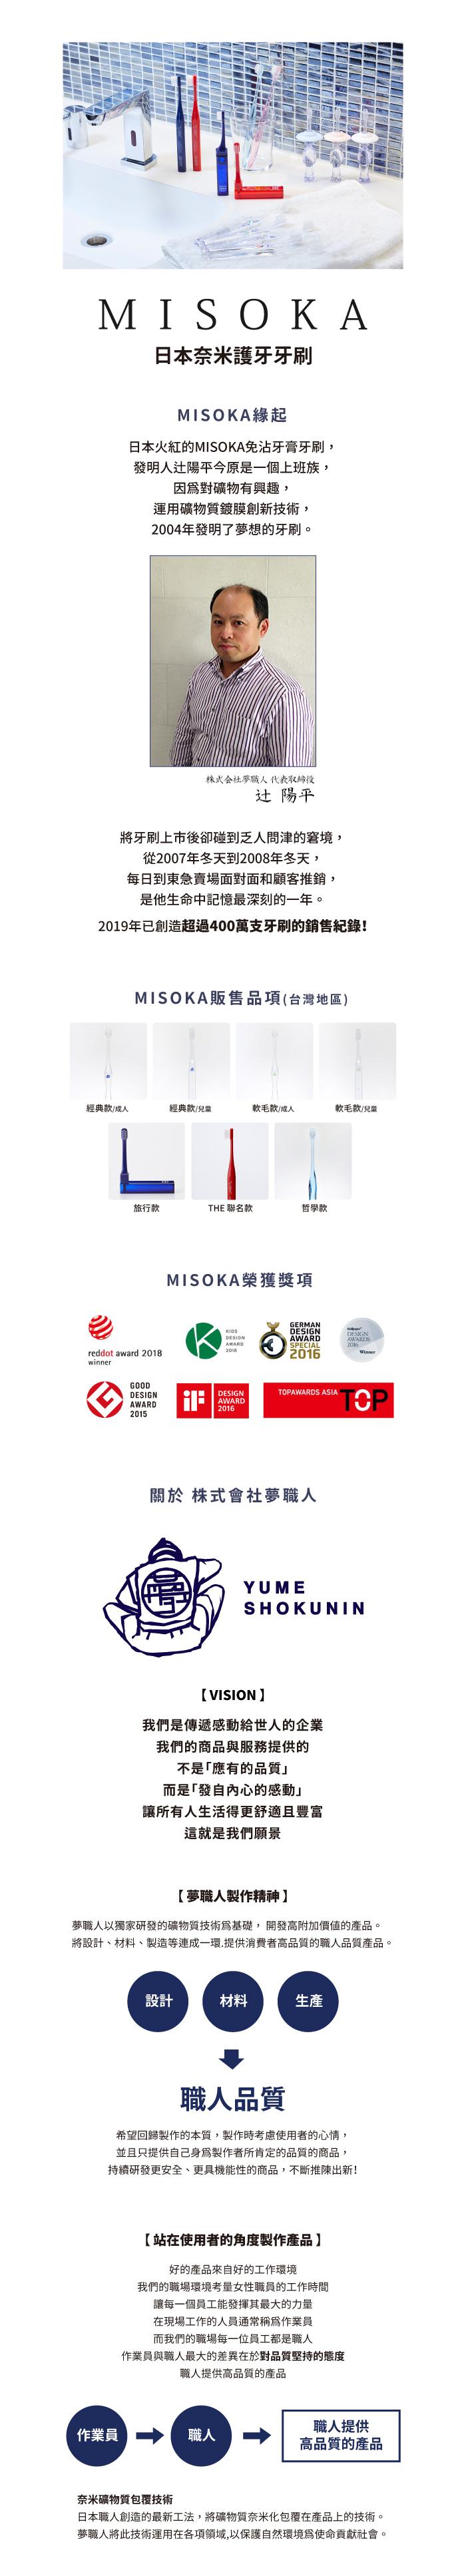 MISOKA │  COMFORT 軟毛款頂級免沾牙膏牙刷 (日本製 / 藍色 / 兒童)